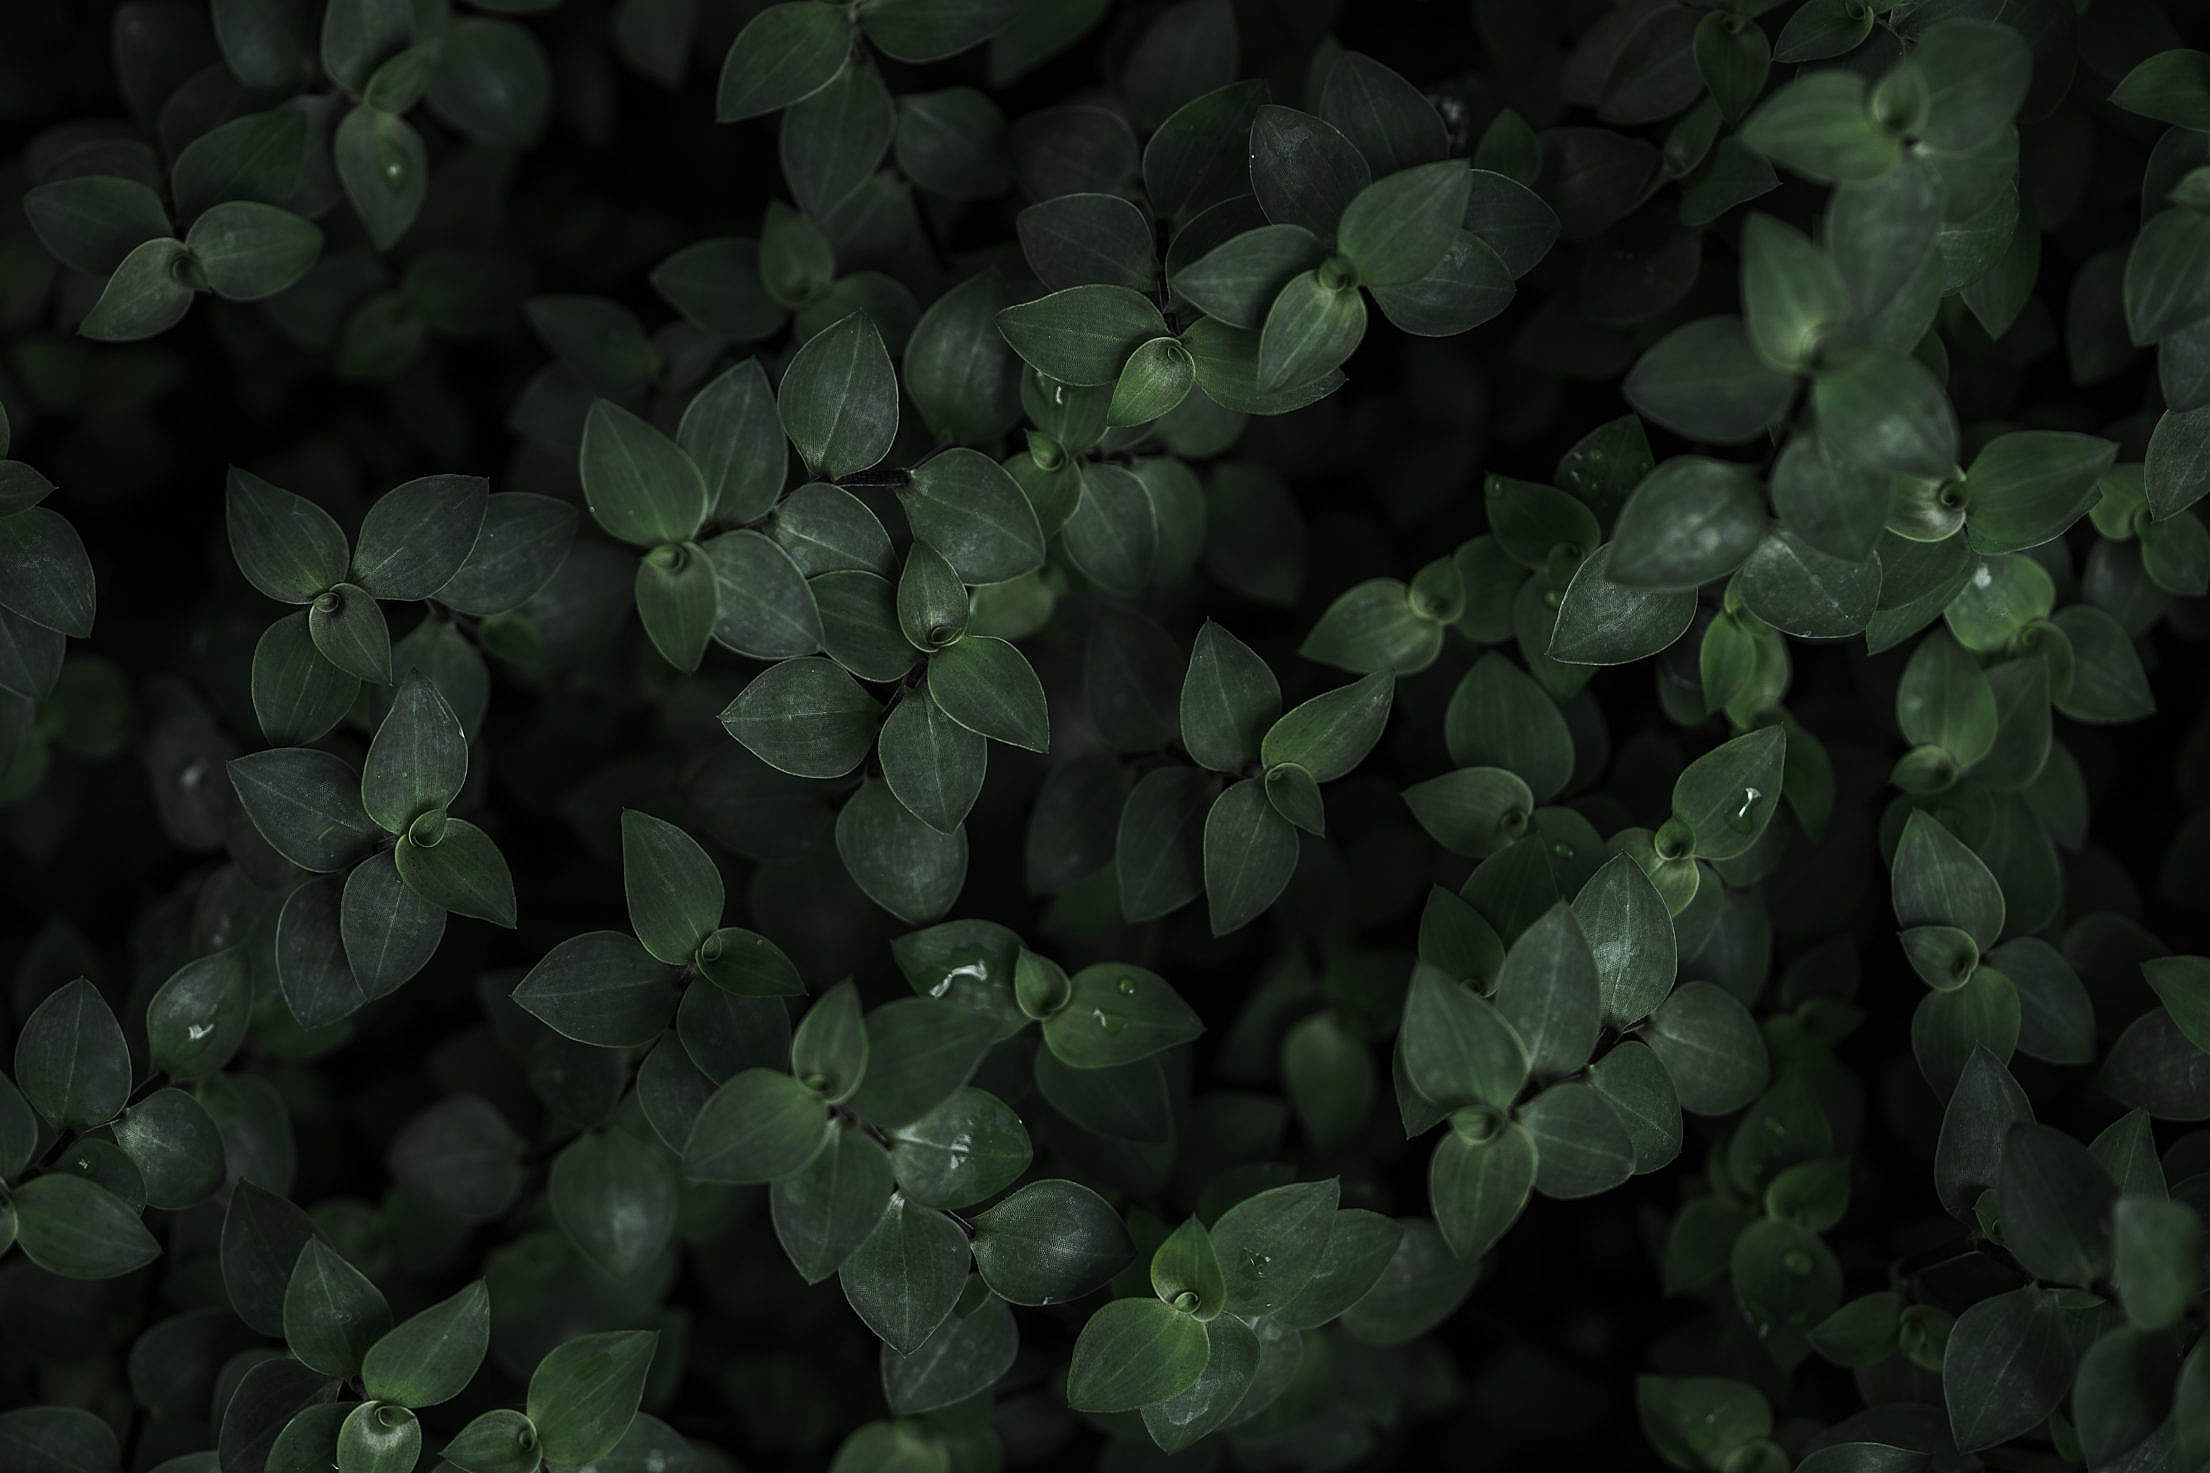 Dark Plant Background Stock Photo picjumbo 2210x1473